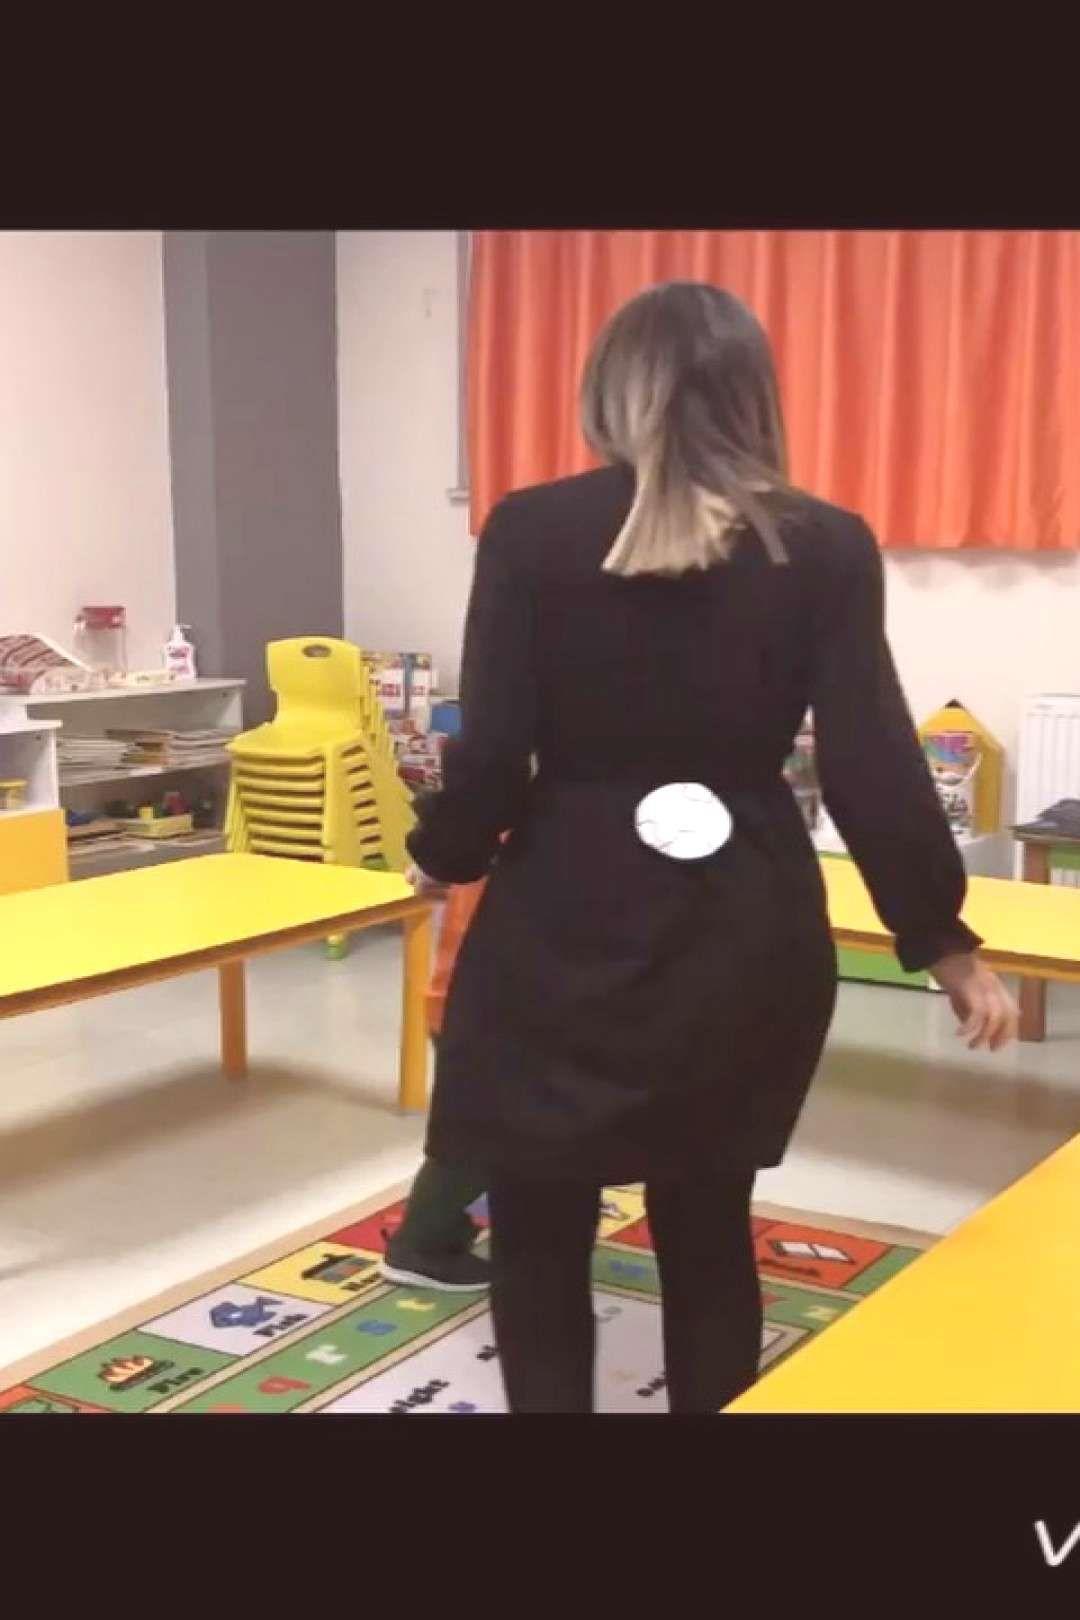 #kidsactivitiesblog #kacabildiin #okulonces #ekilleri #gosterme #arkanda #kadar #kac #ki Arkanda ki şekilleri gosterme kacabildiğin kadar kac #okuloncesYou can find Kids activities blog and more on our website.Arkand...